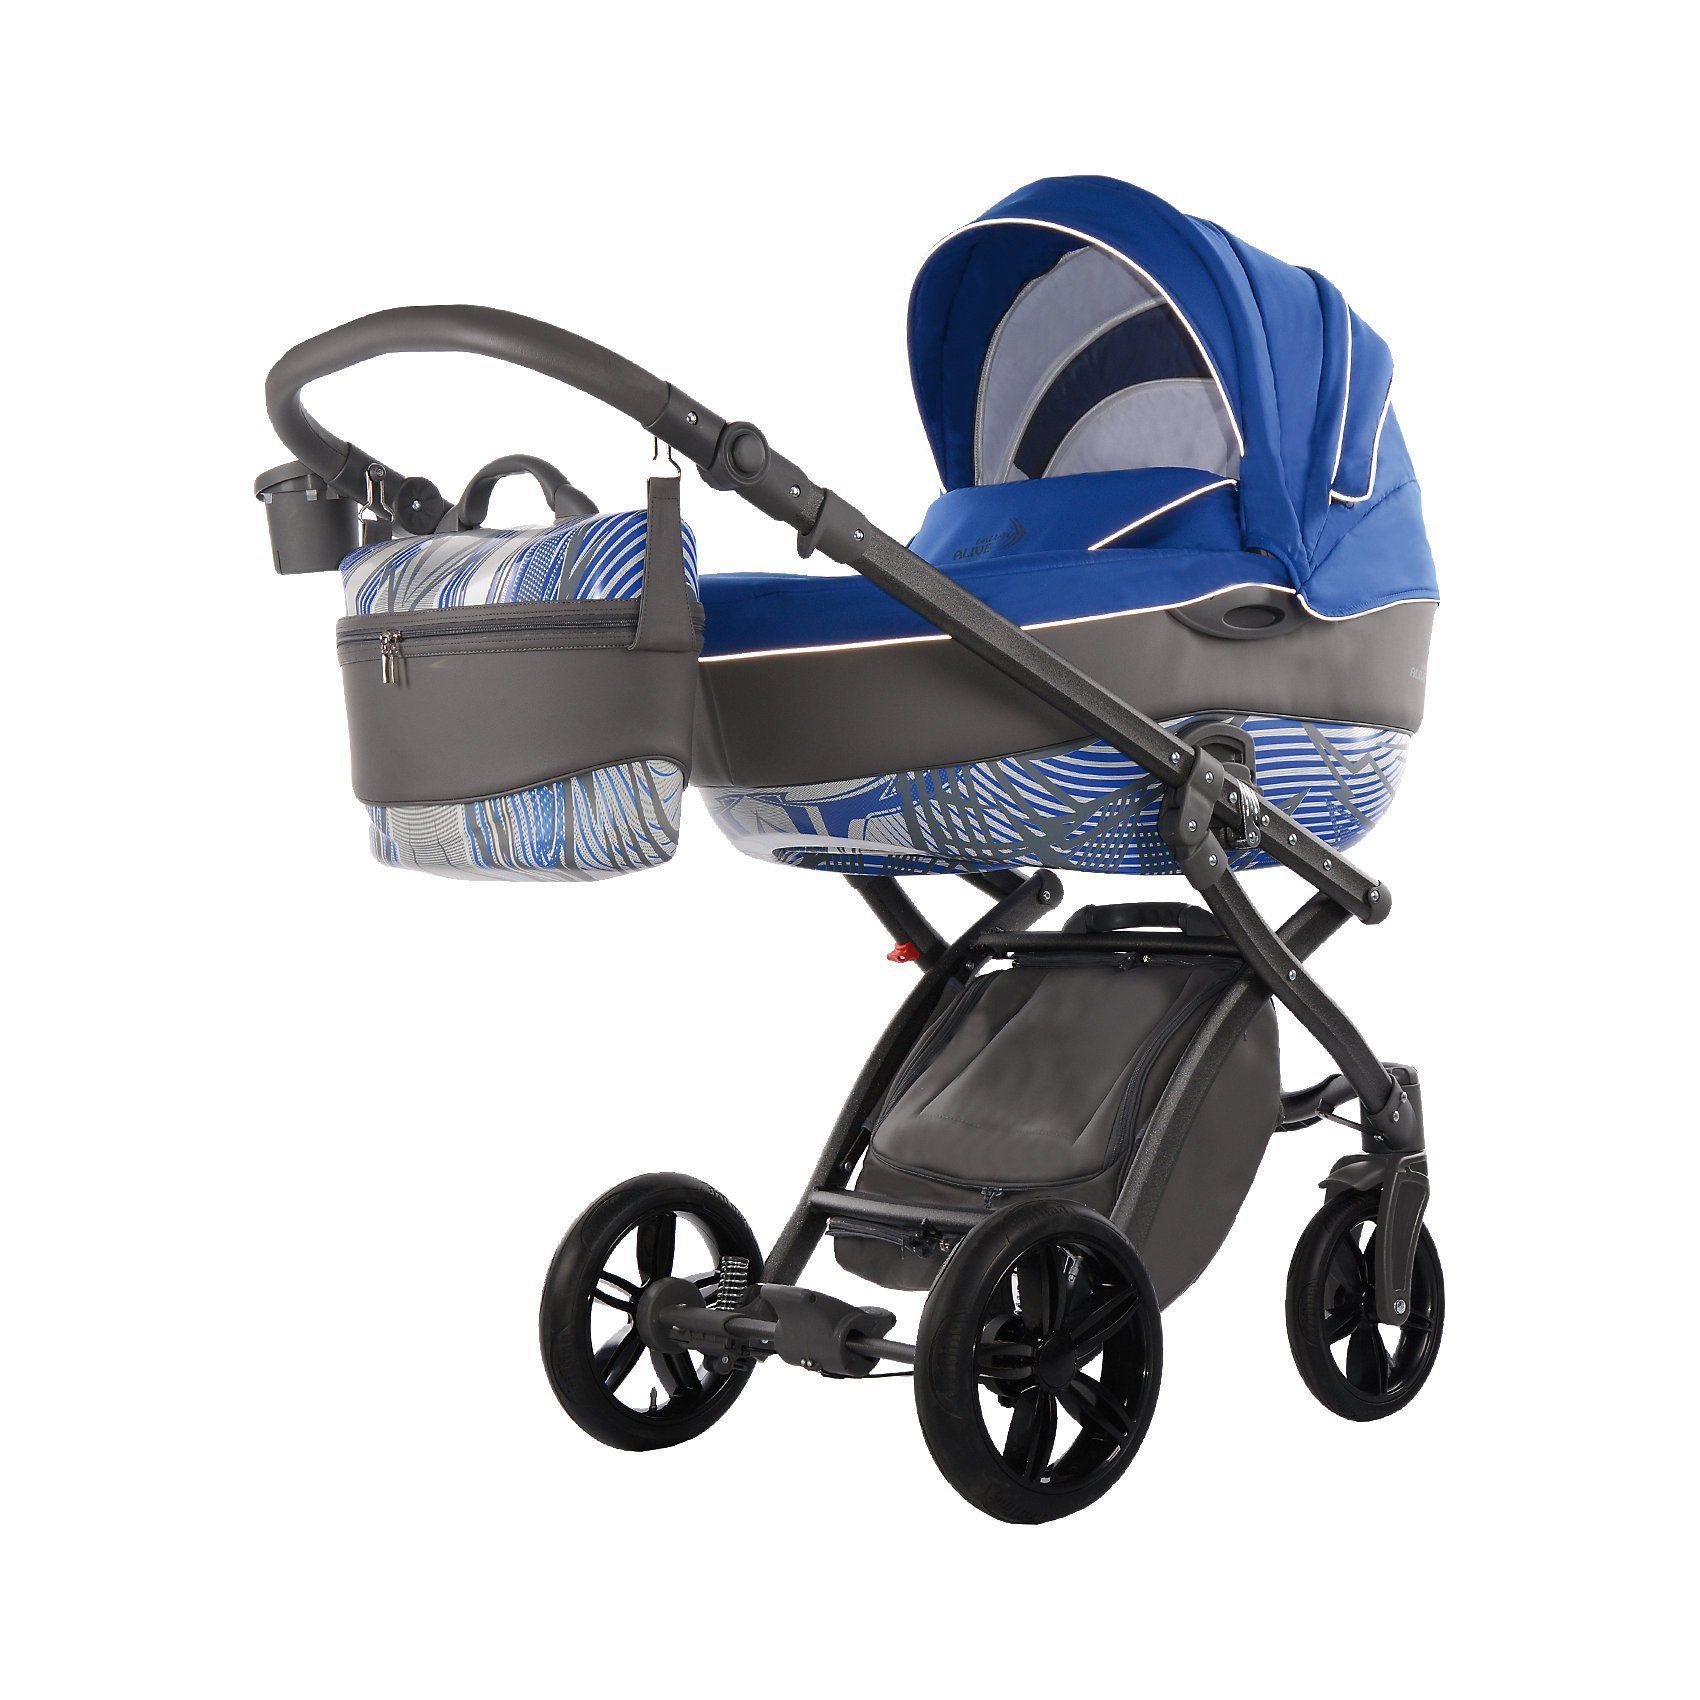 knorr-baby Kombi Kinderwagen Alive Energy, azurblau